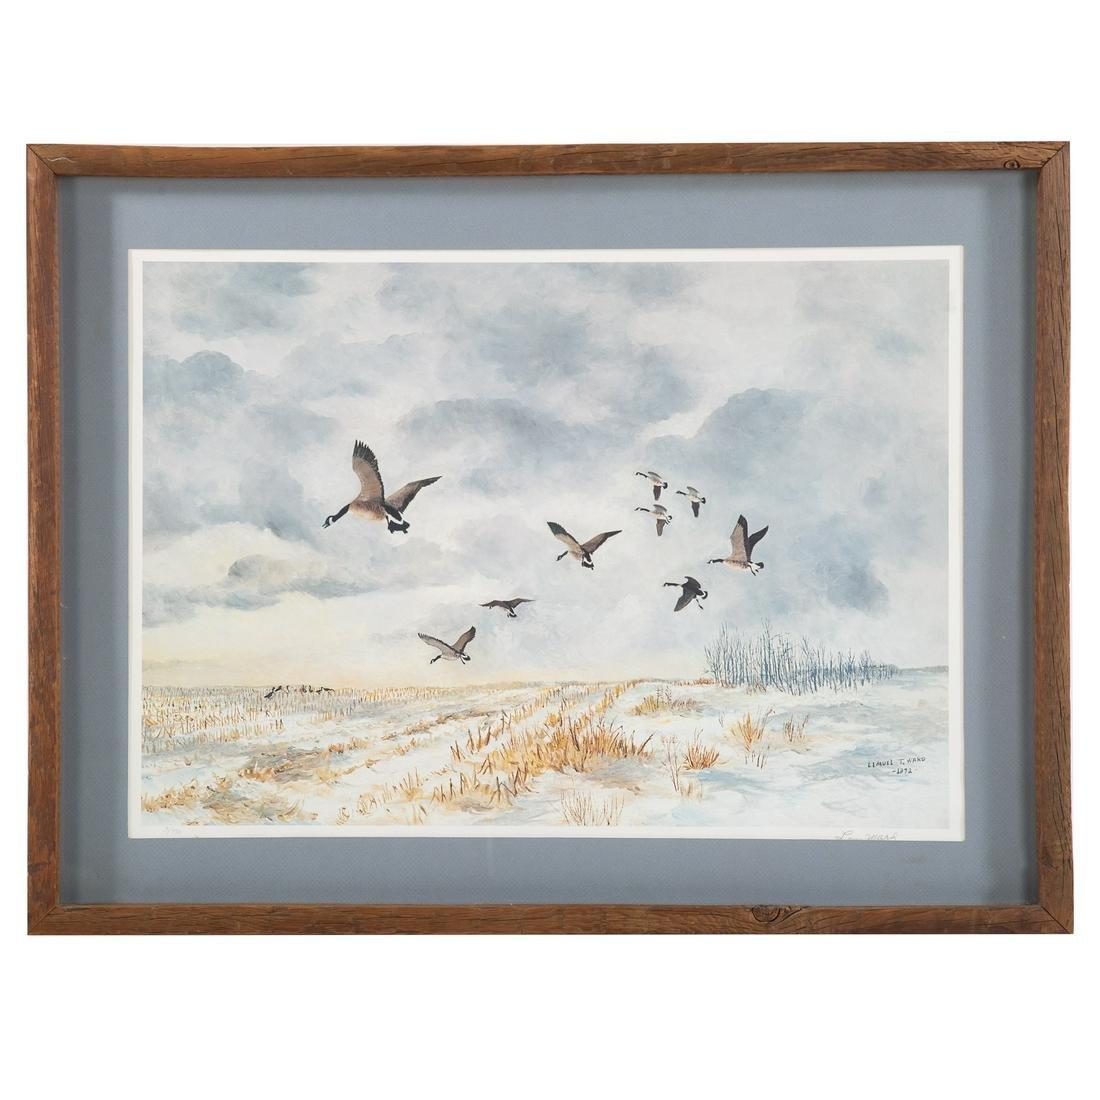 Lemuel T. Ward. Geese Flying Over Marsh